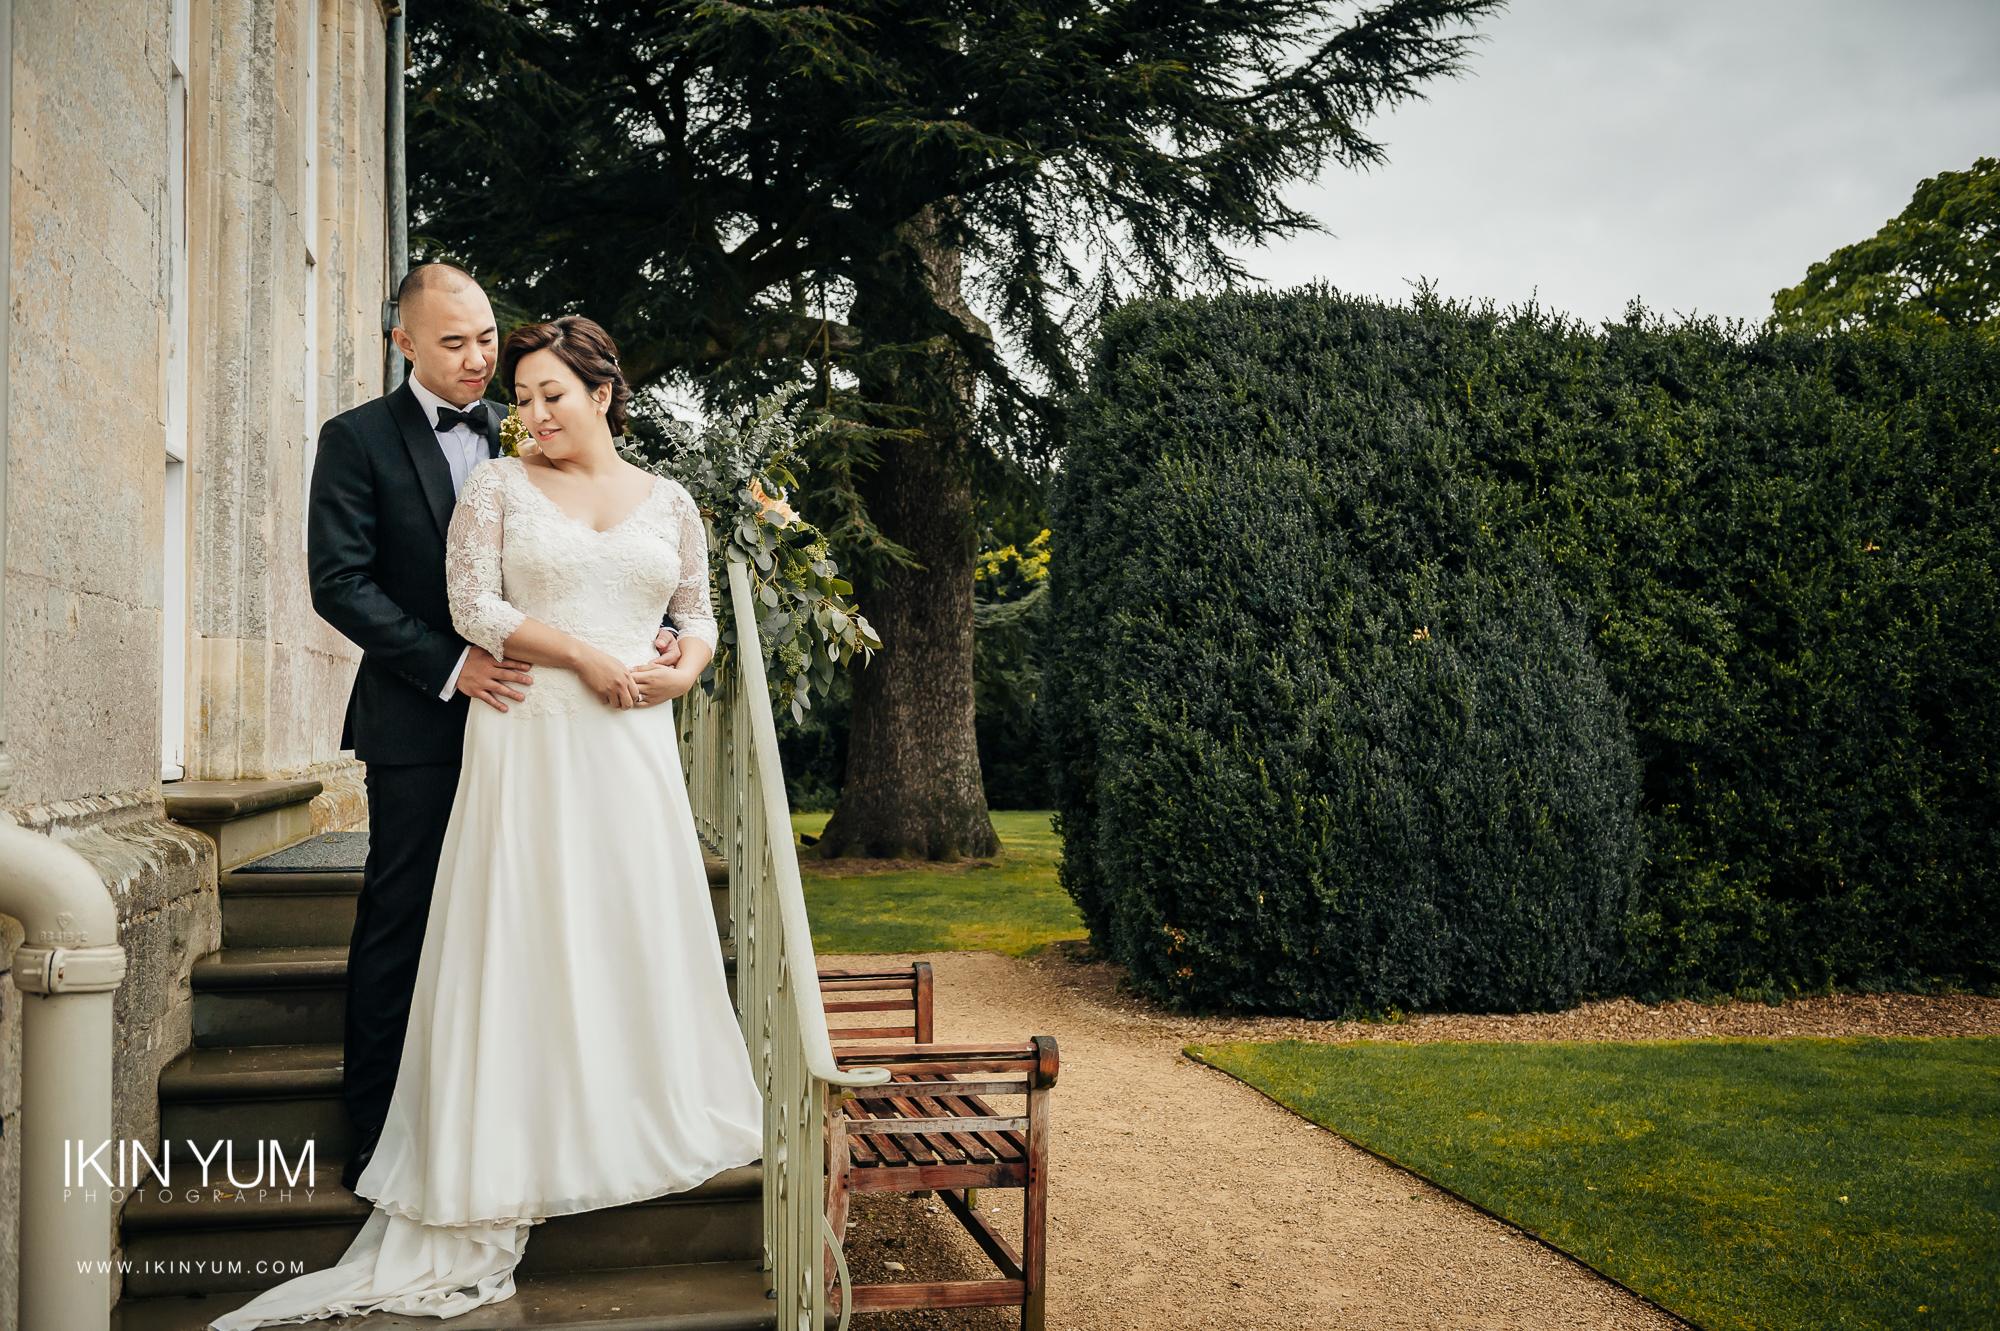 Elmore Court Wedding - London wedding photographer -  英国伦敦 婚礼 摄影